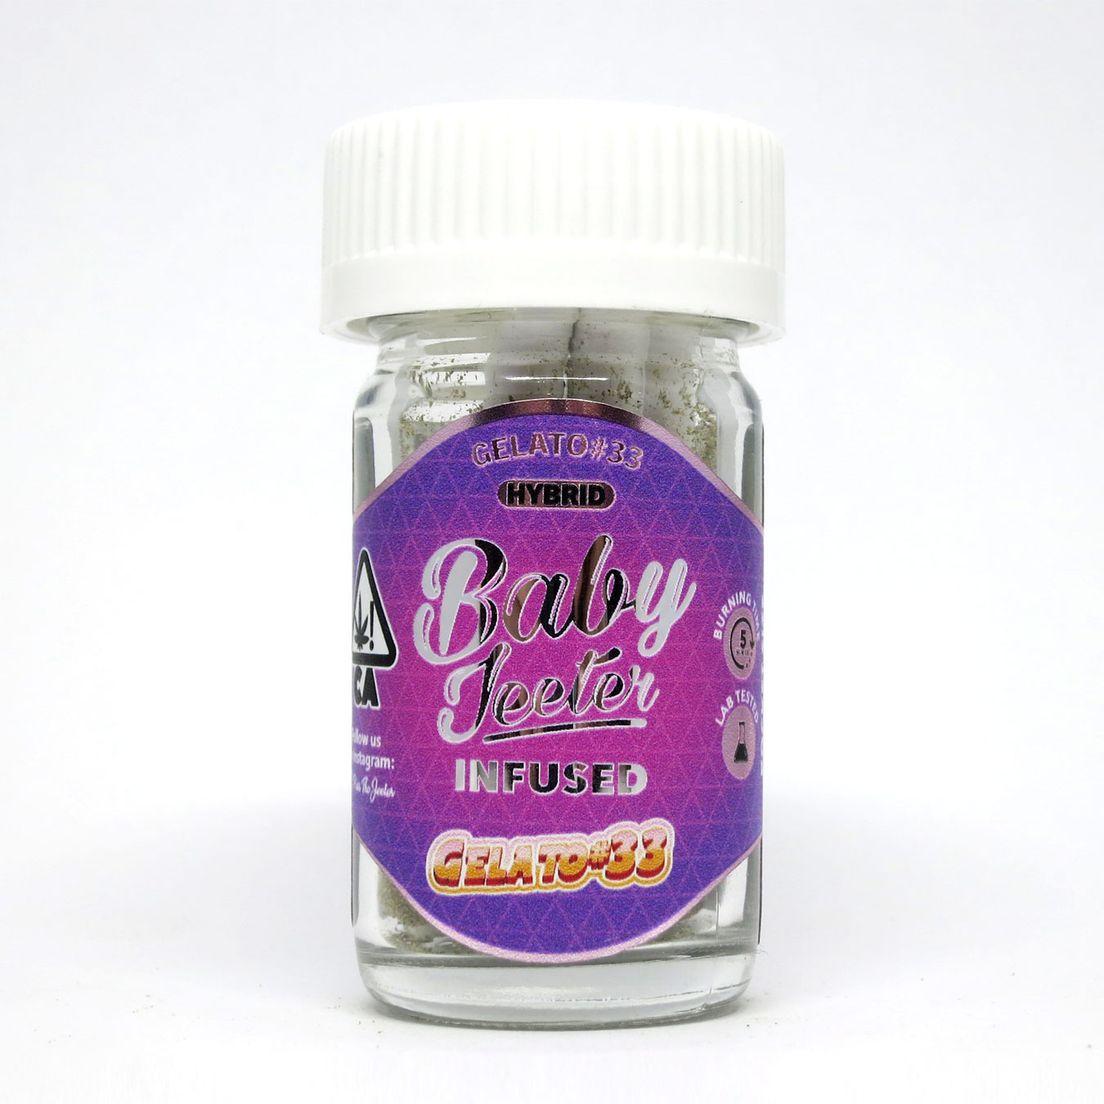 BABY Jeeter Infused 5pk Gelato #33